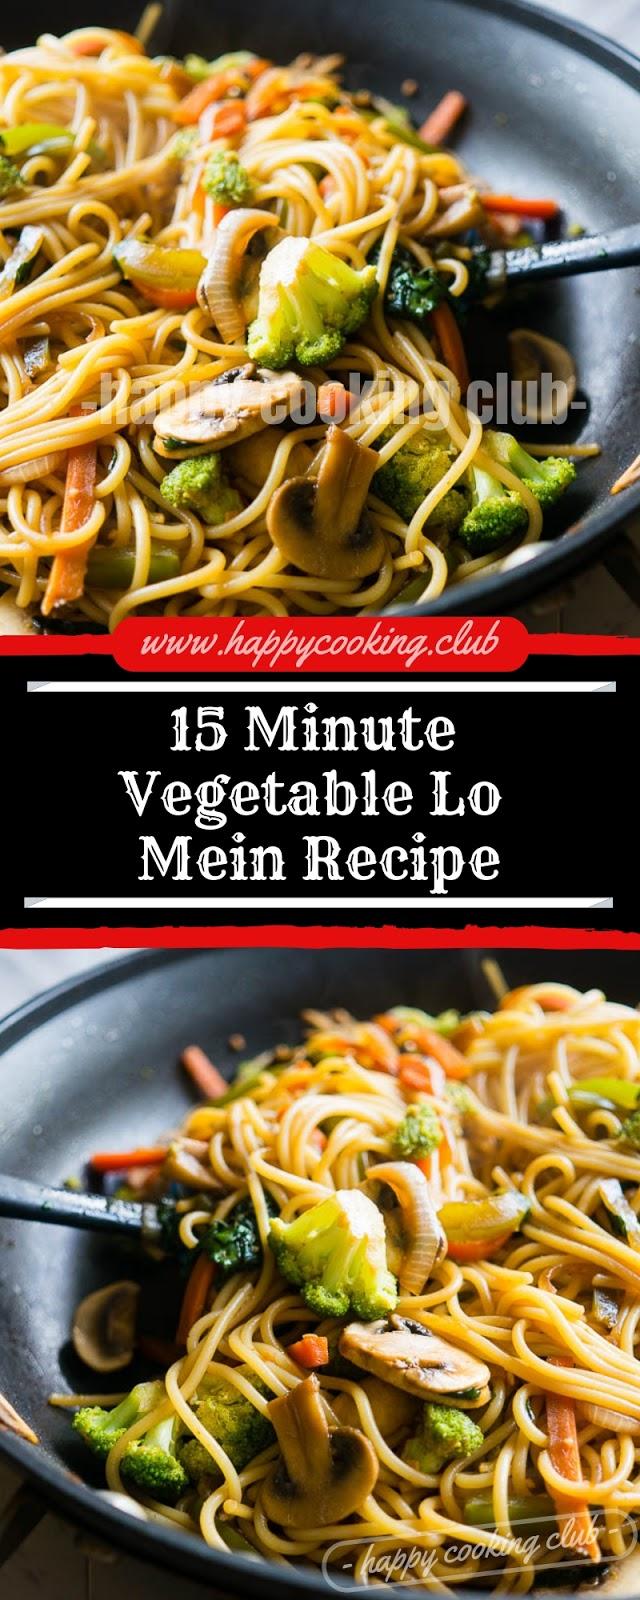 15 Minute Vegetable Lo Mein Recipe